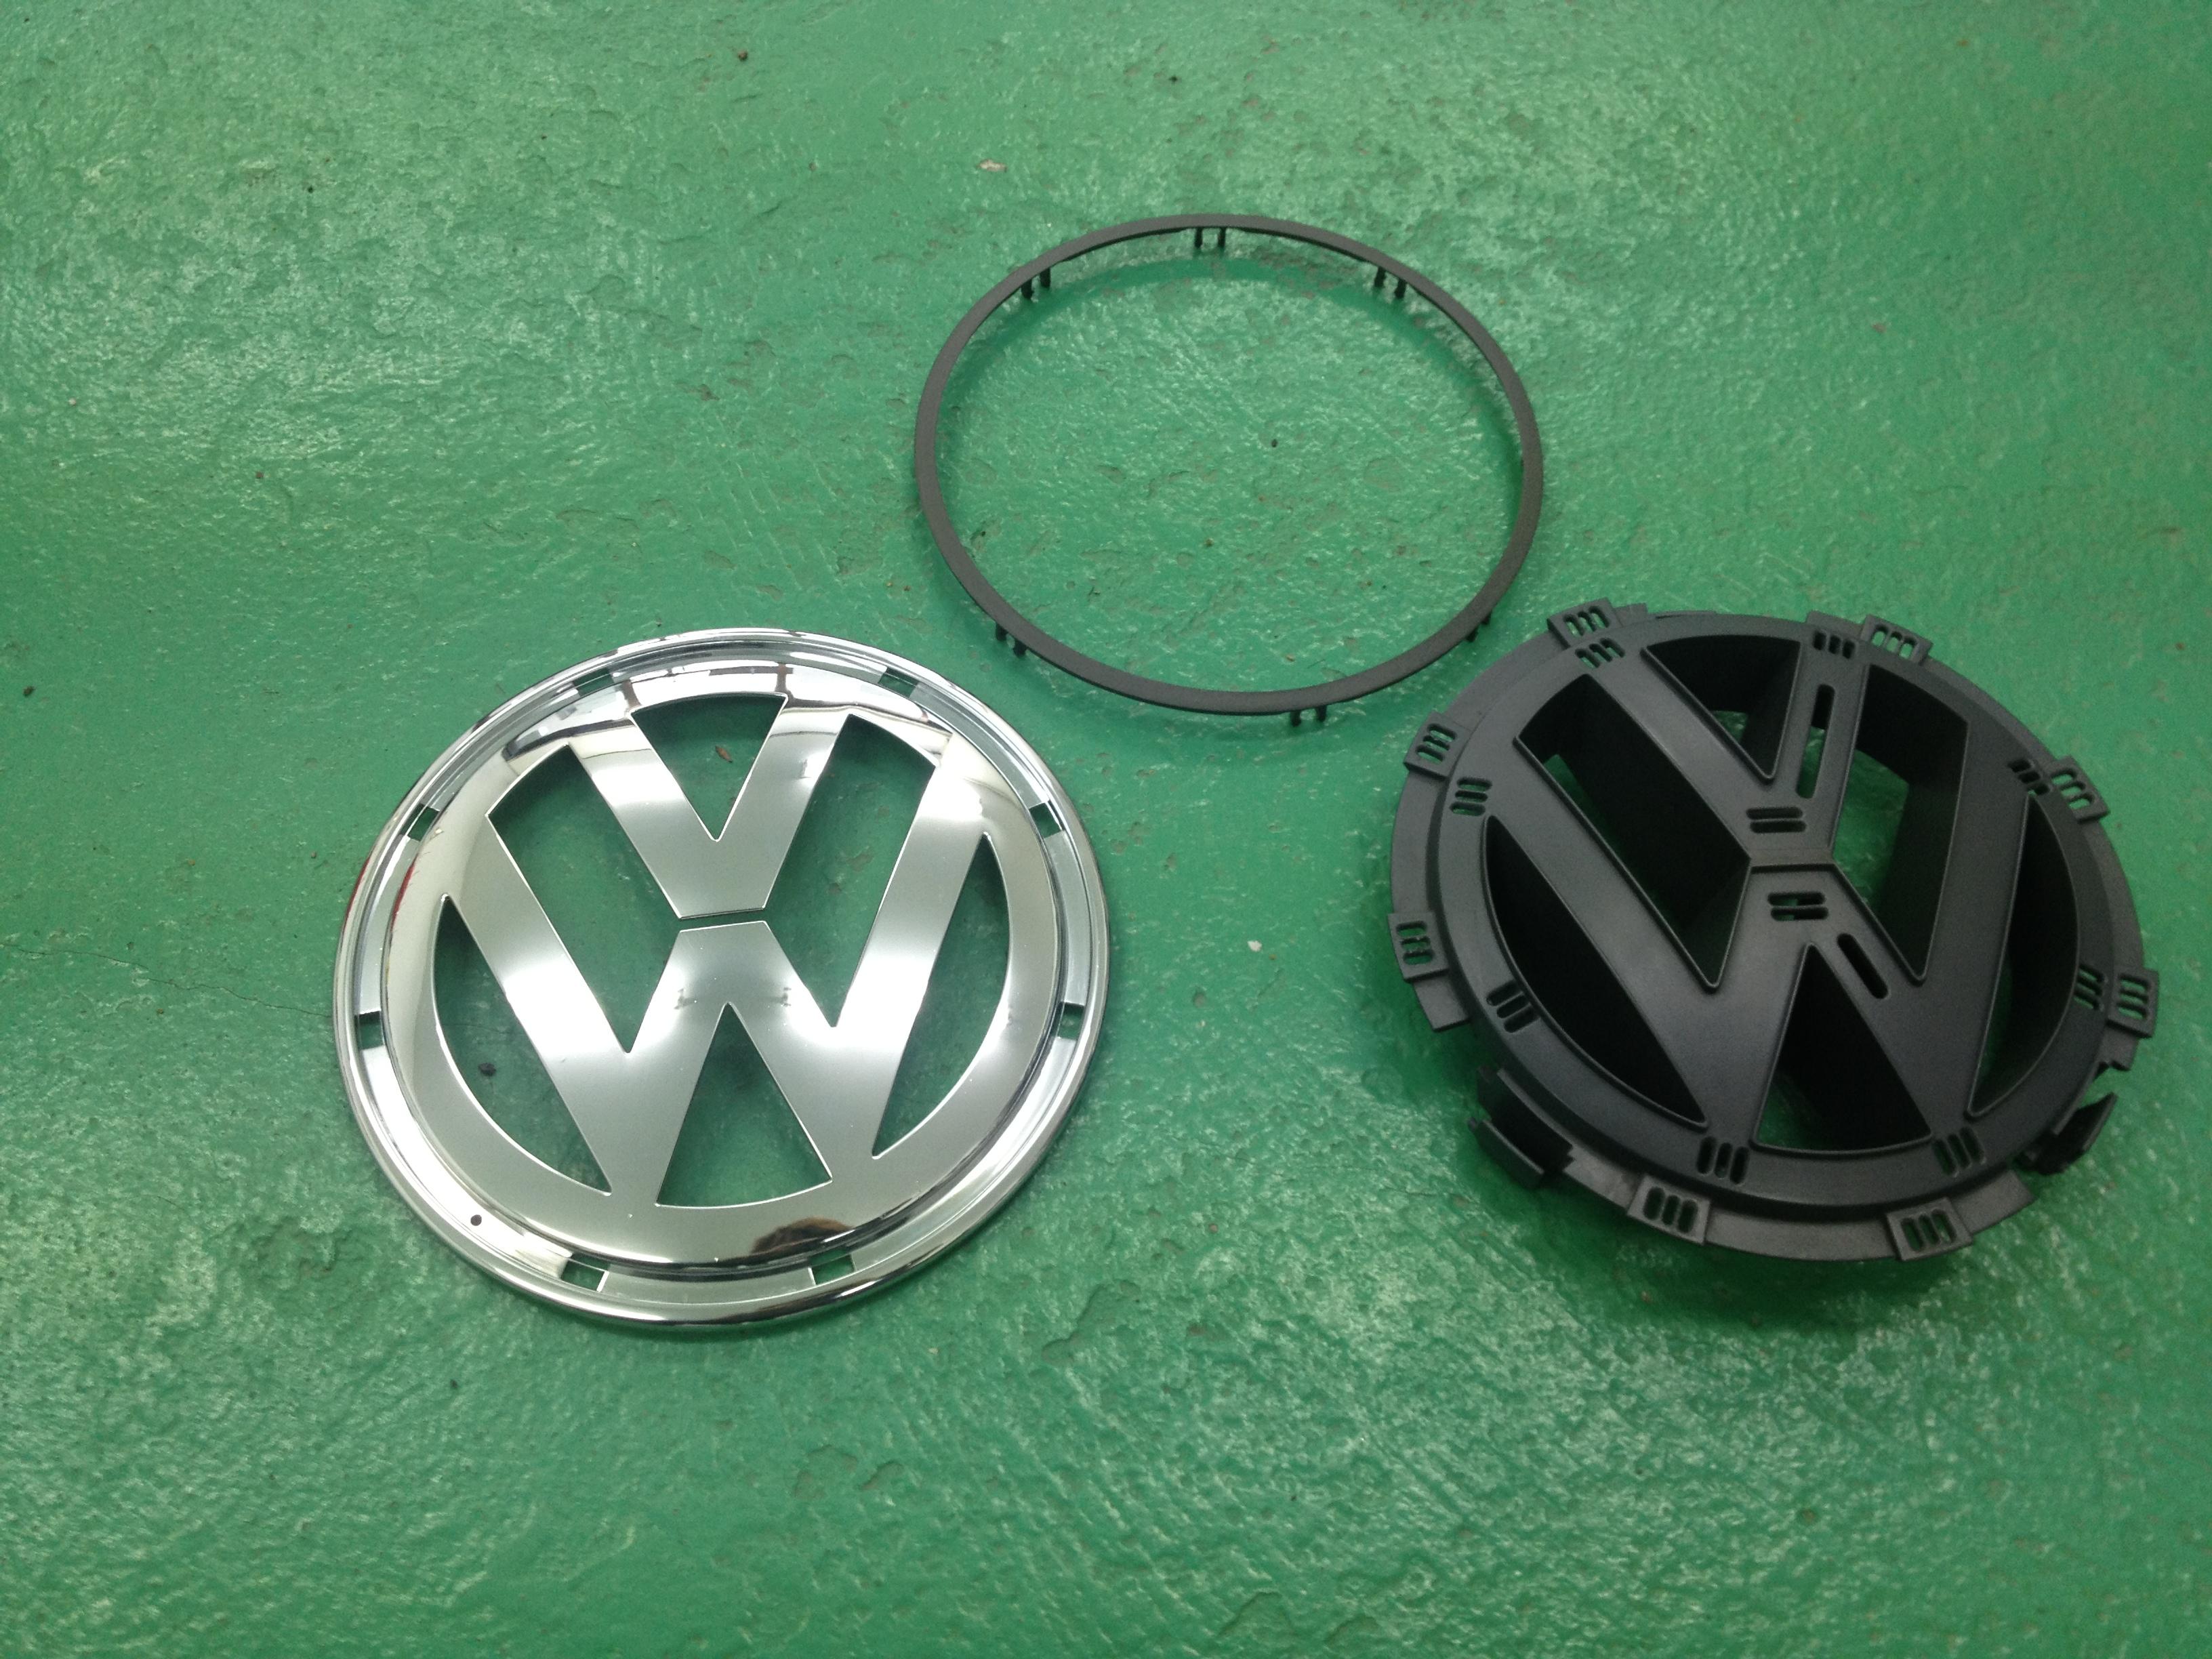 VWフォルクスワーゲンフロントエンブレム分解